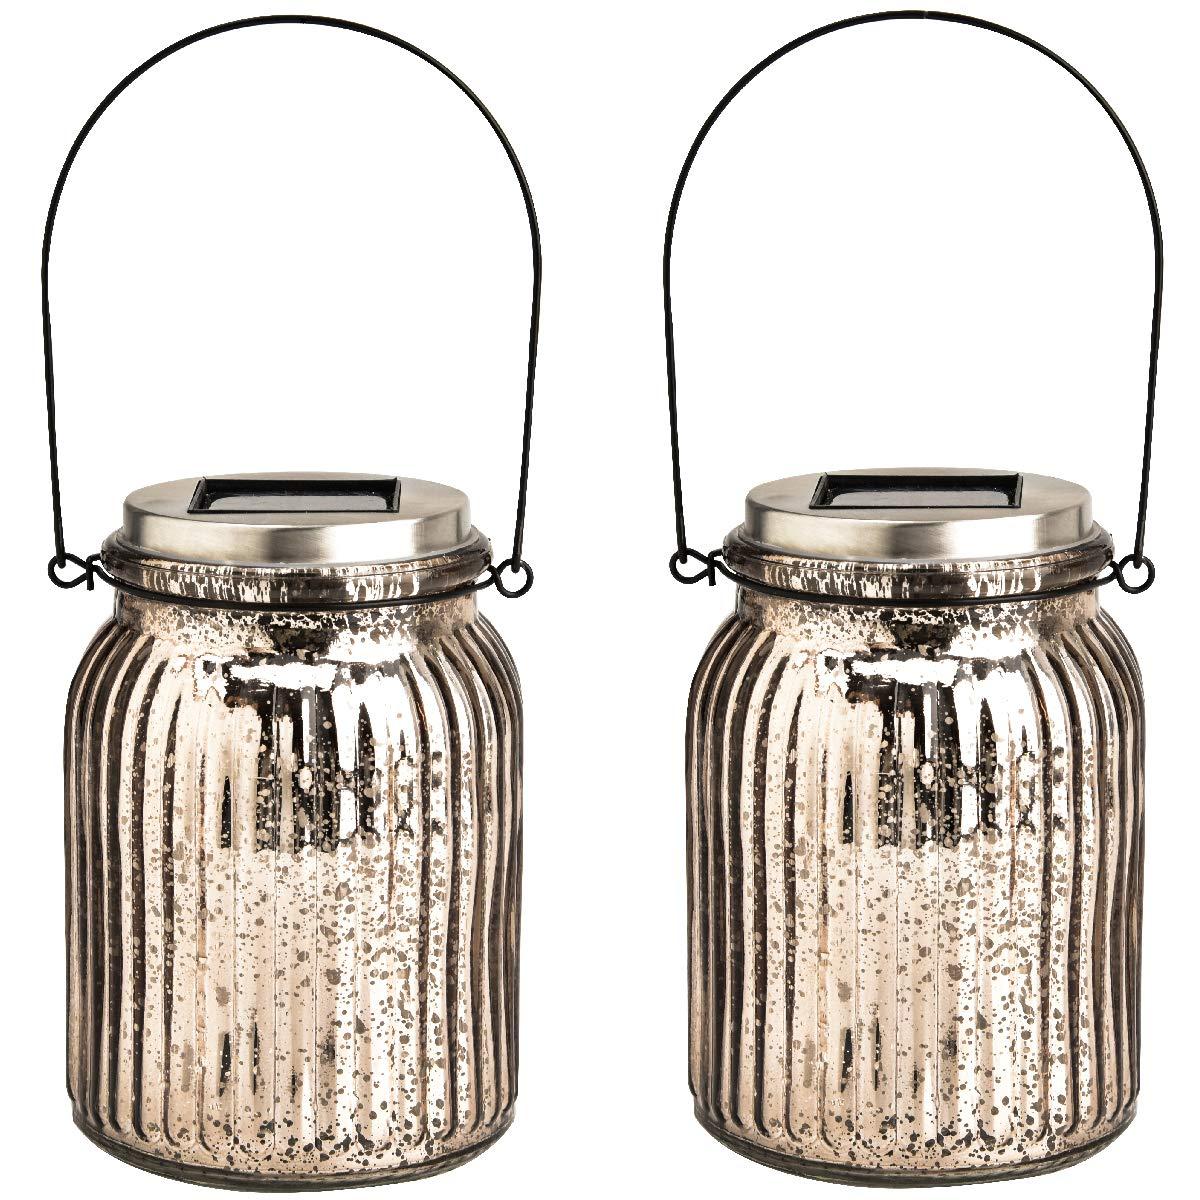 GIGALUMI Solar Powered Mercury Glass Mason Jar Lights, 2 Pack Hanging Solar Laterns Table Lights for Garden, Patio, Backyard.(Ideal Gift)